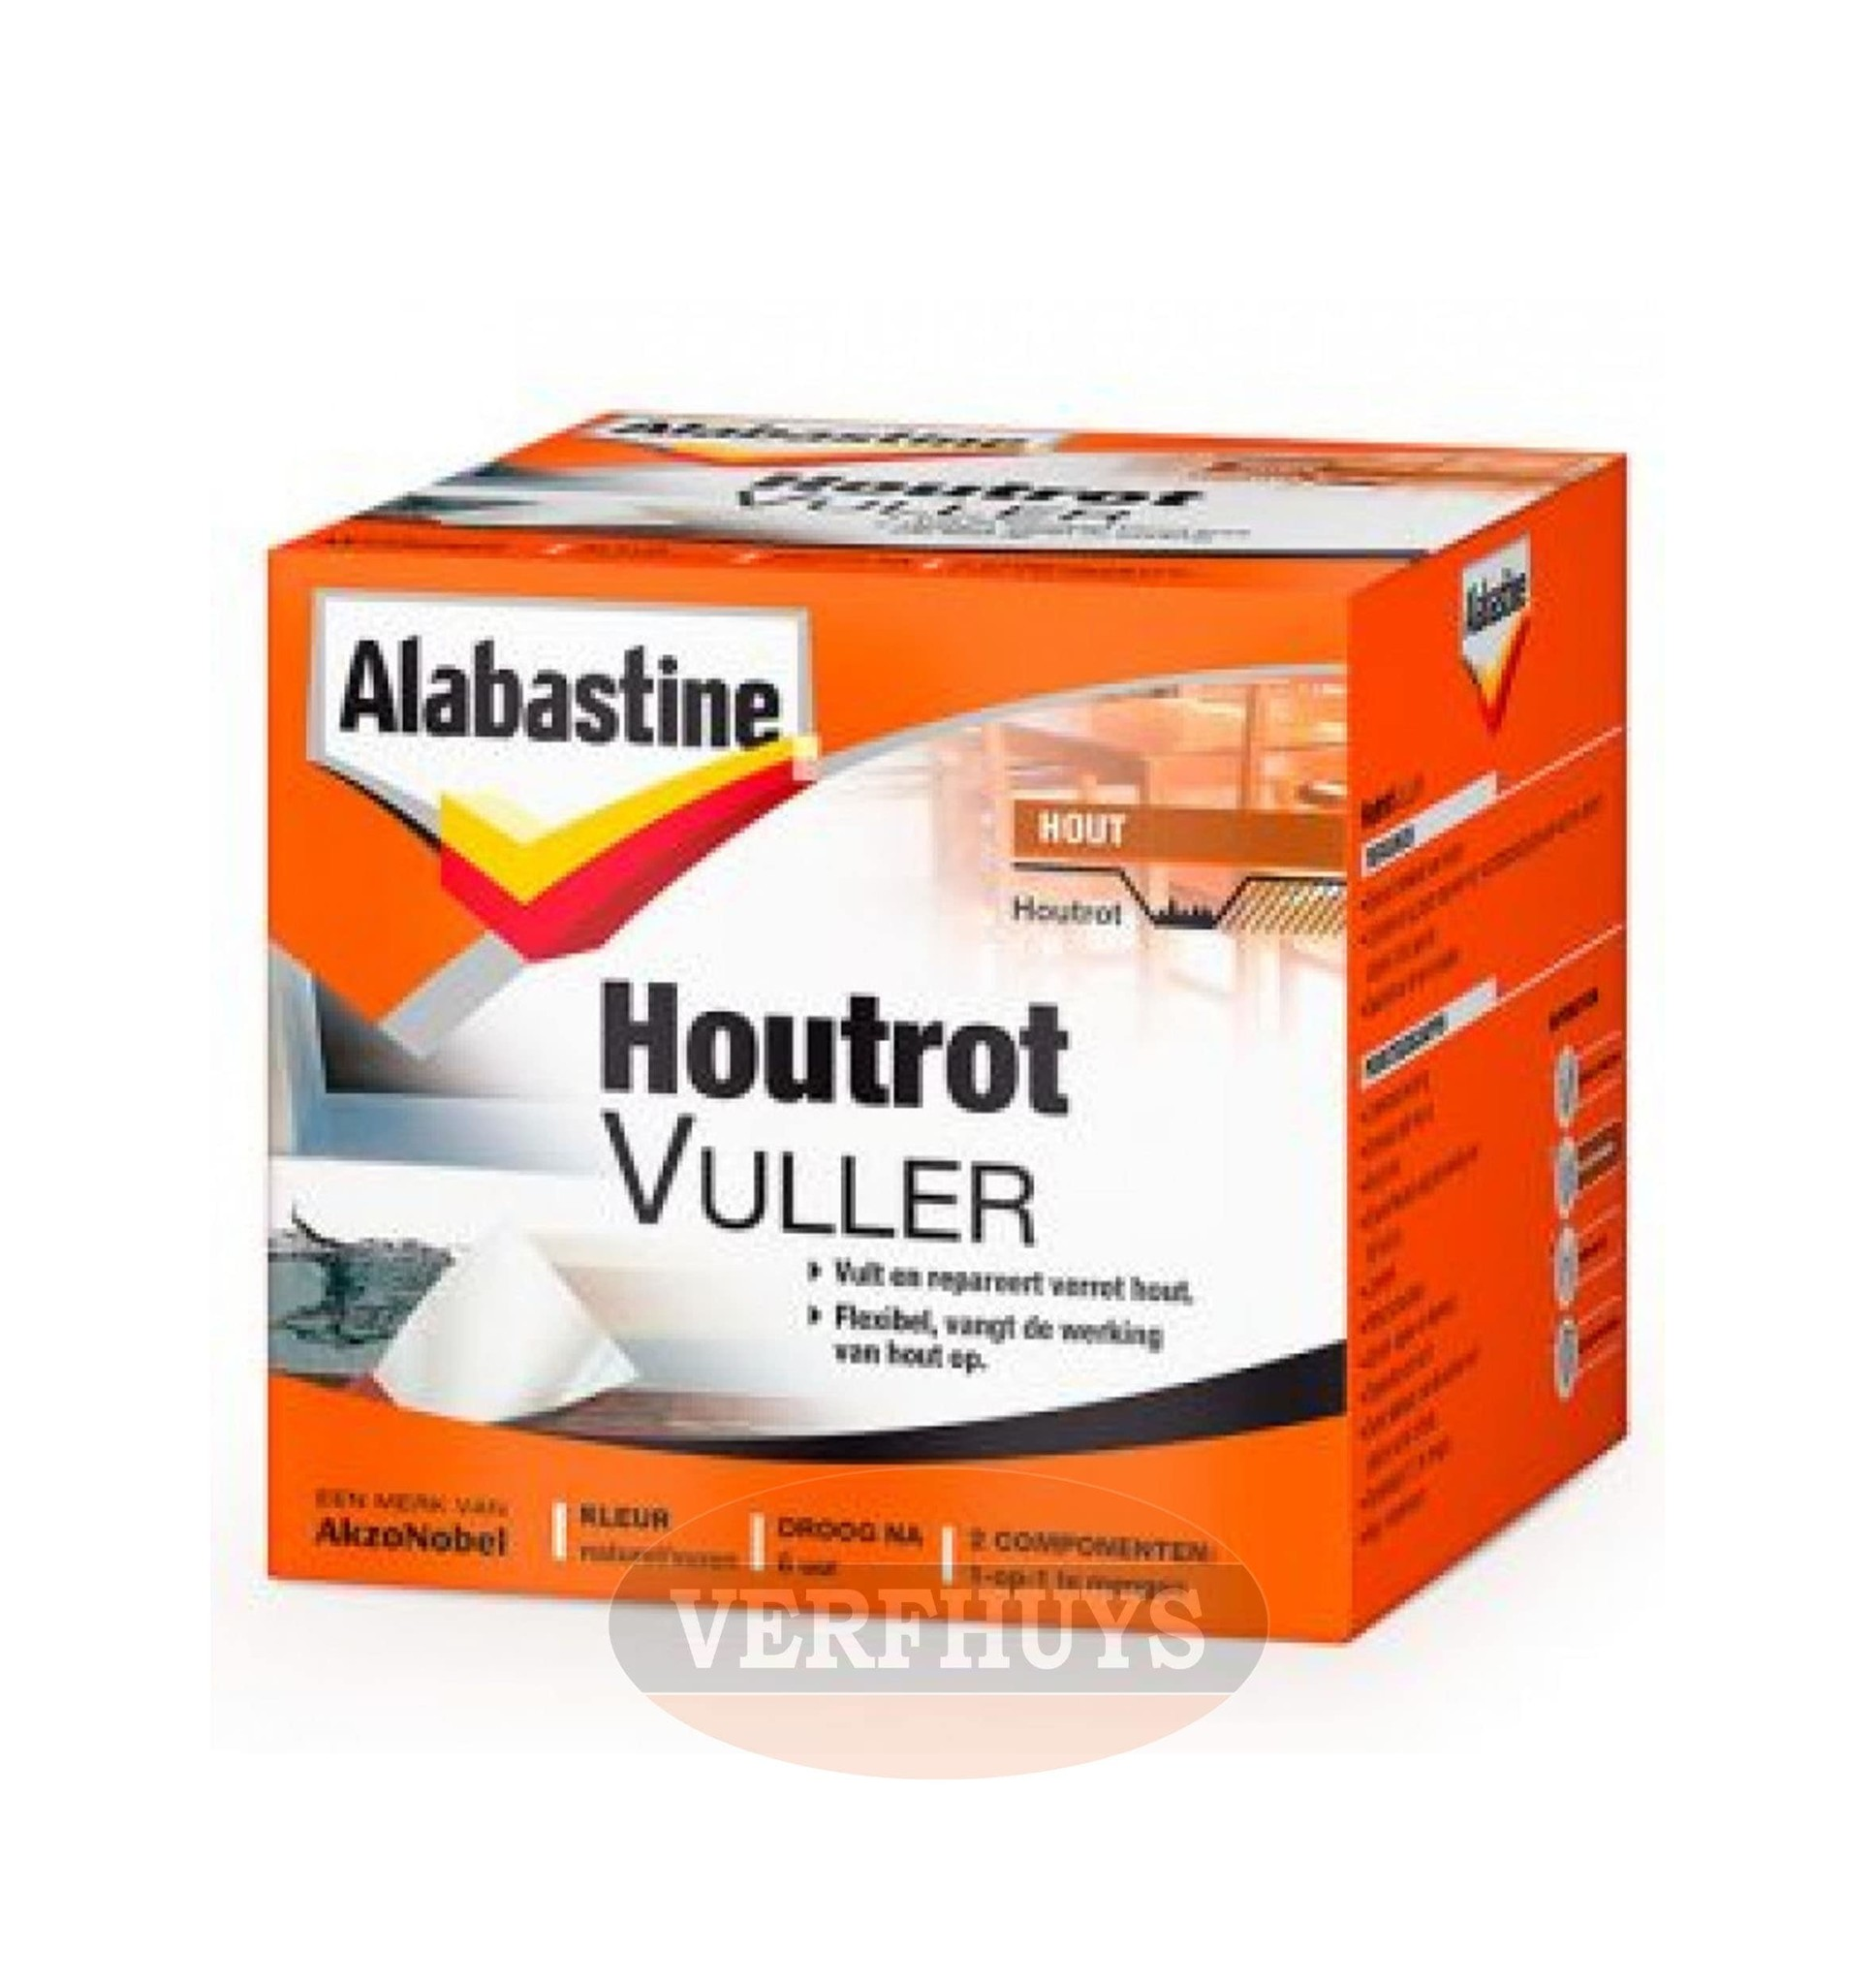 Alabastine Houtrot Vuller Nodig Bestel Bij Verfhuys Verfhuys